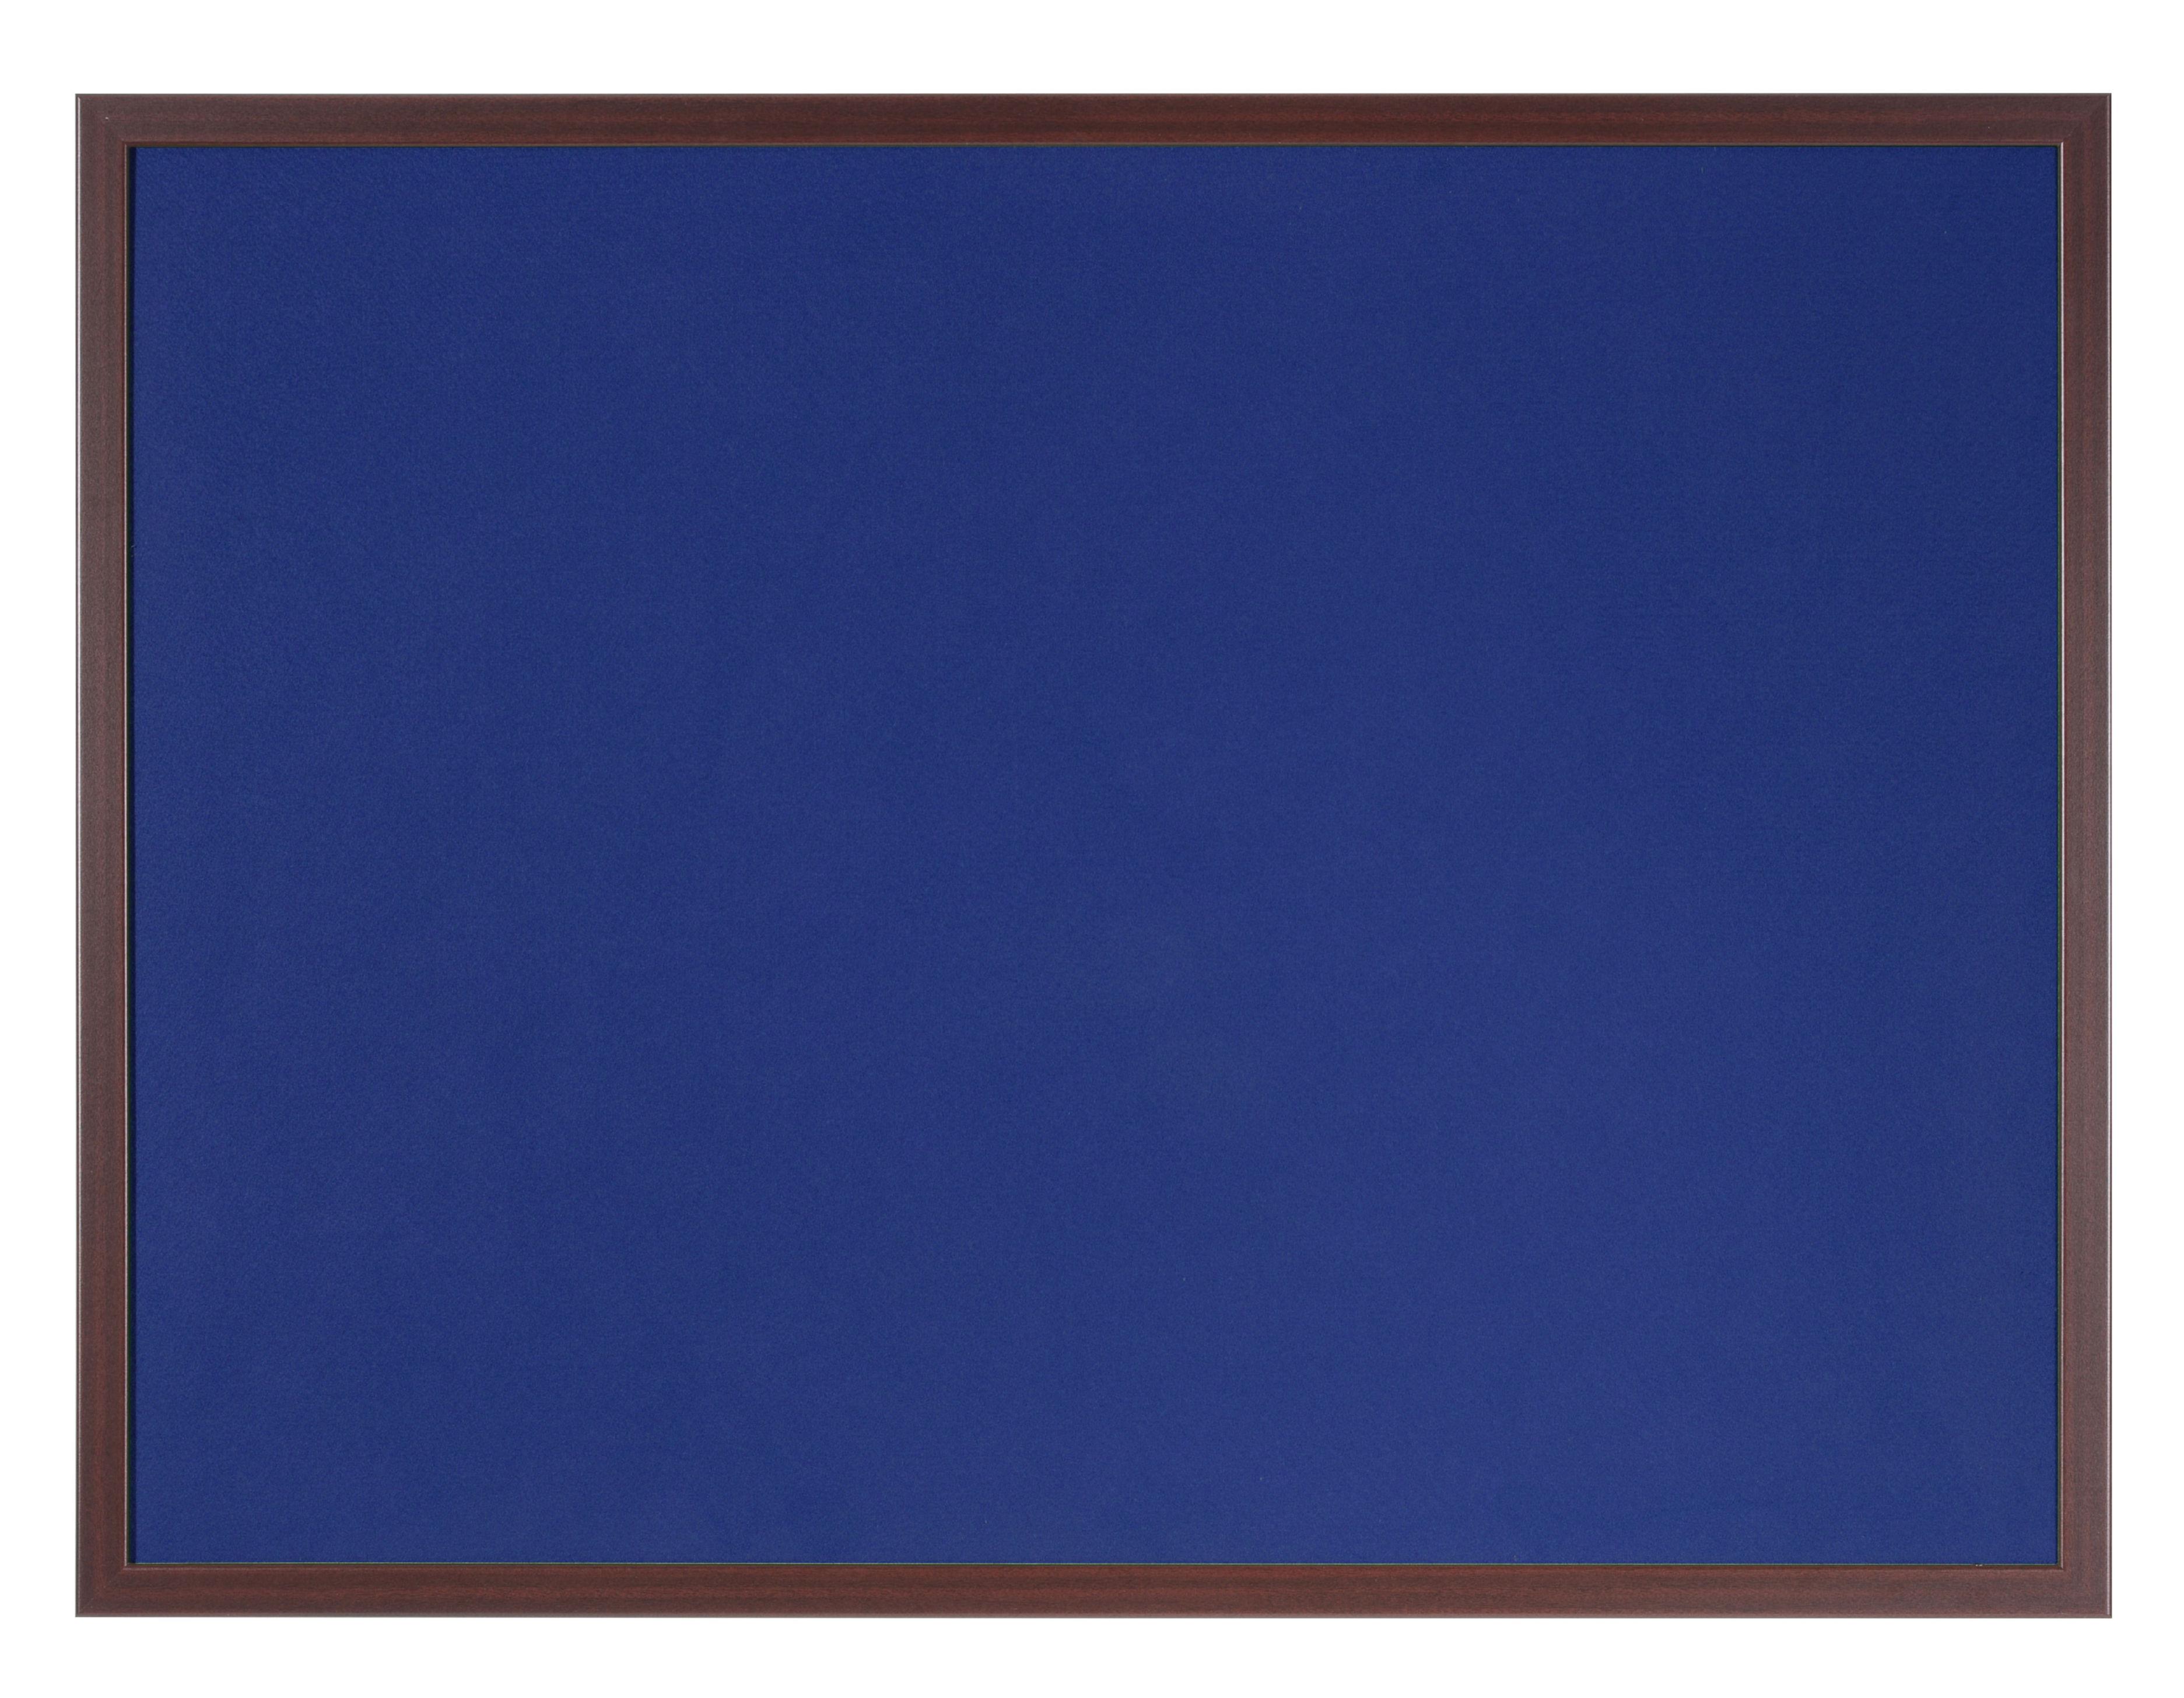 Felt Bi-Office Earth-It Blue Felt 180x120cm Cherry Wood 32 mm